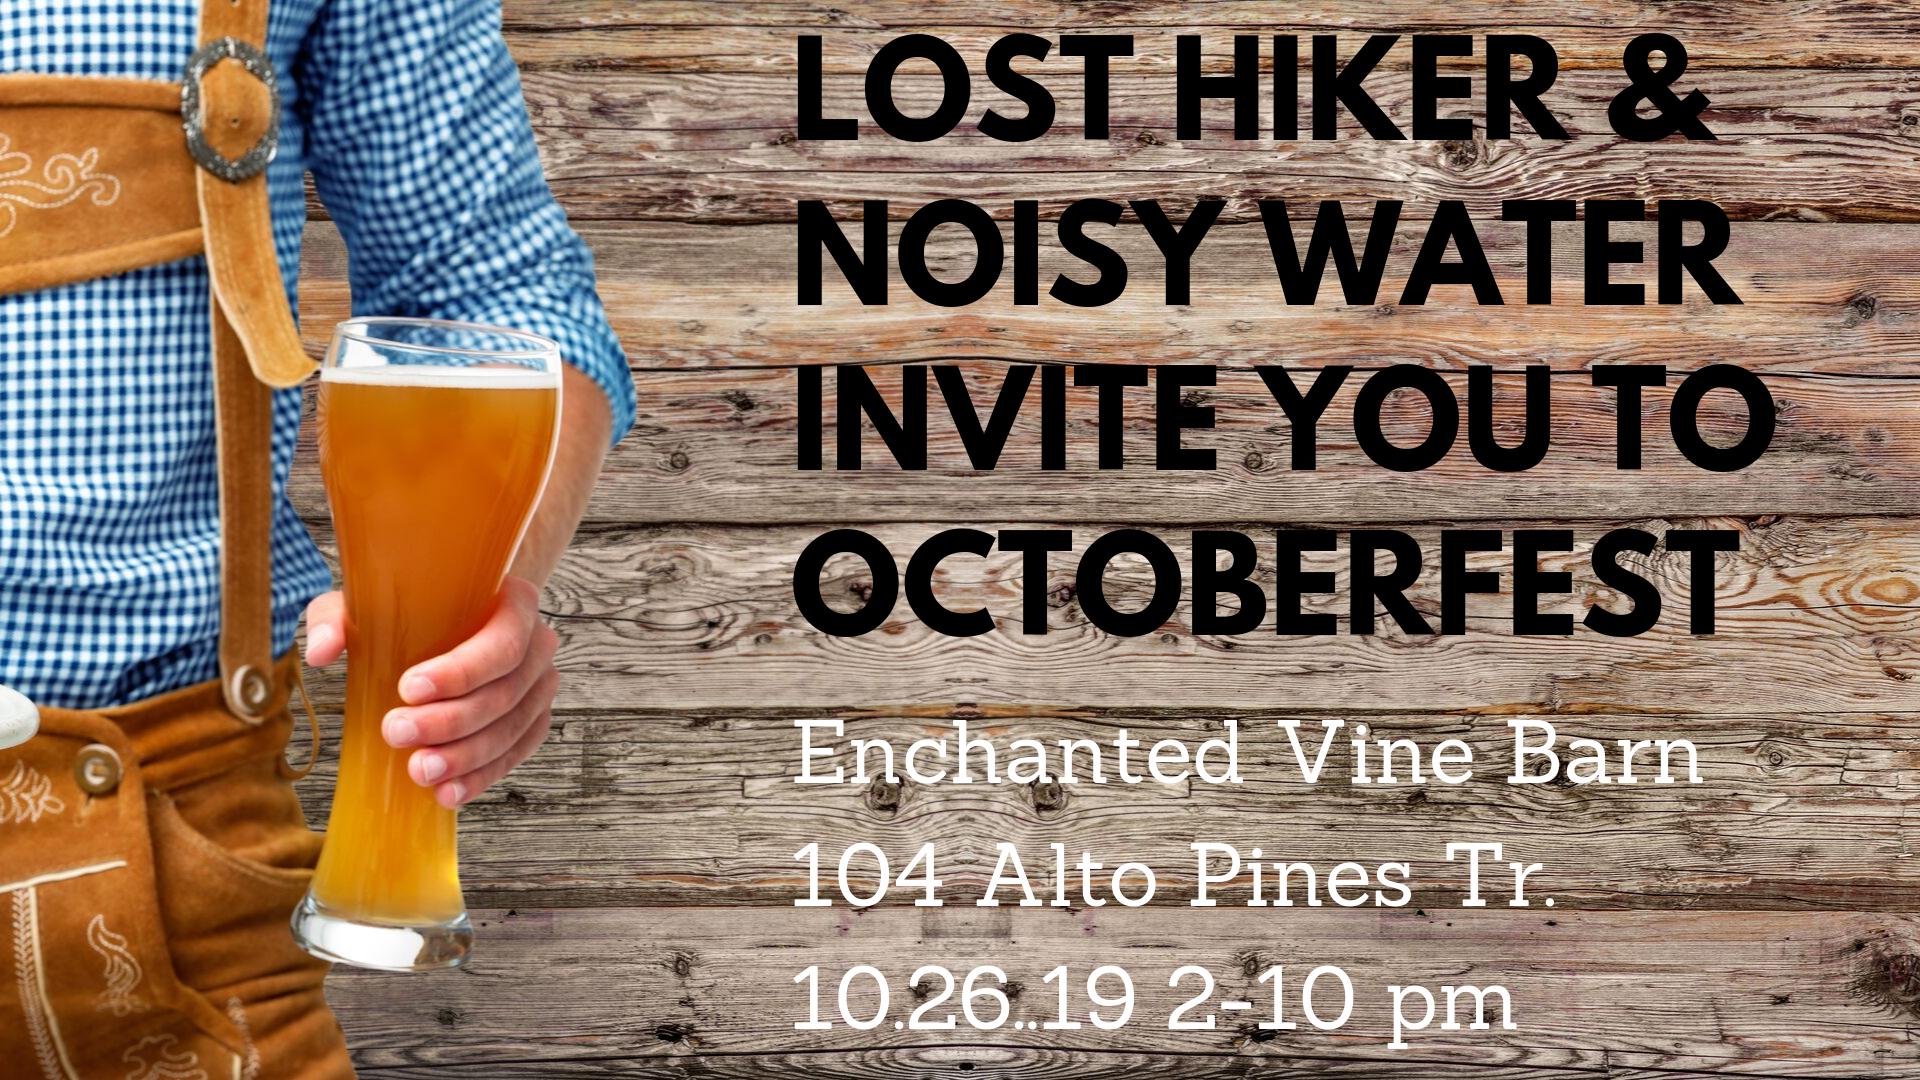 Octoberfest at Enchanted Vine.png